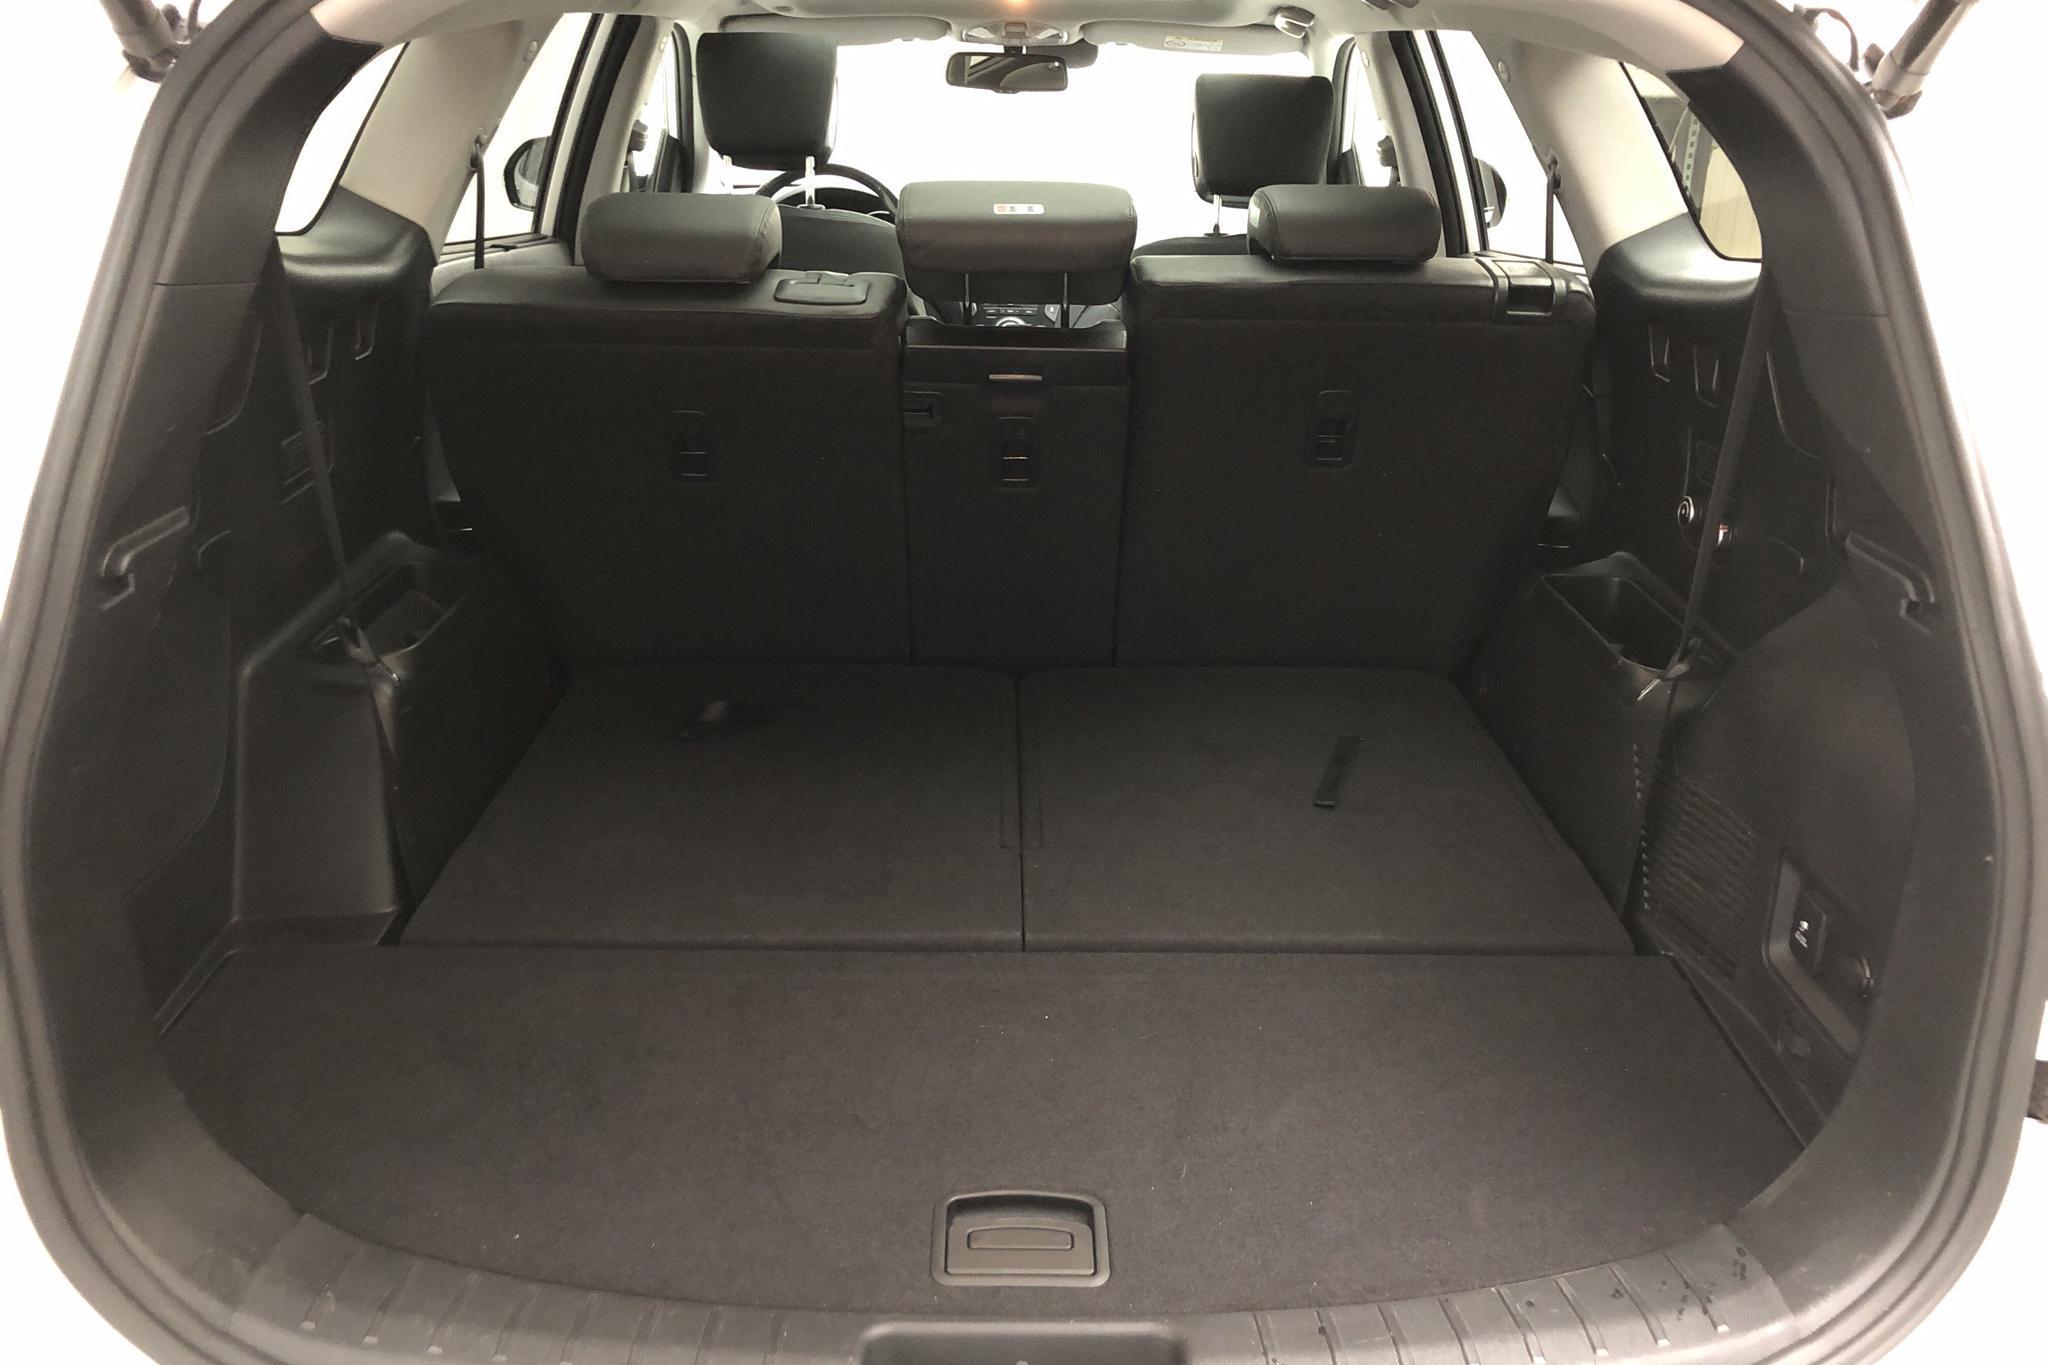 Hyundai Grand Santa Fé 2.2 D 4WD (197hk) - 138 740 km - Automatic - white - 2016